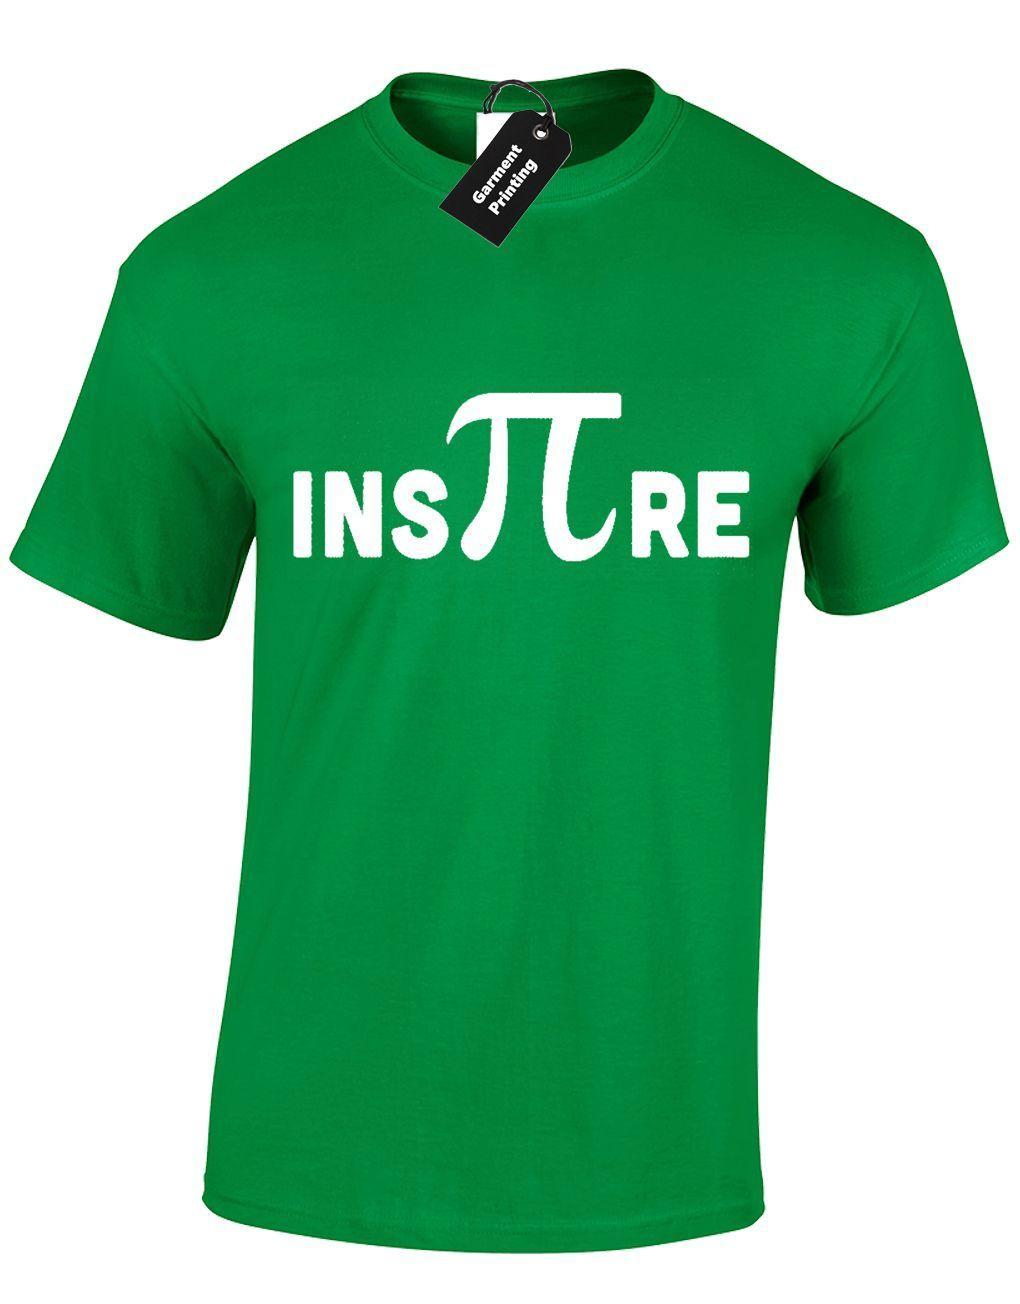 Ins Pi Re Mens T Shirt Funny New Quality Big Bang Theory Sheldon